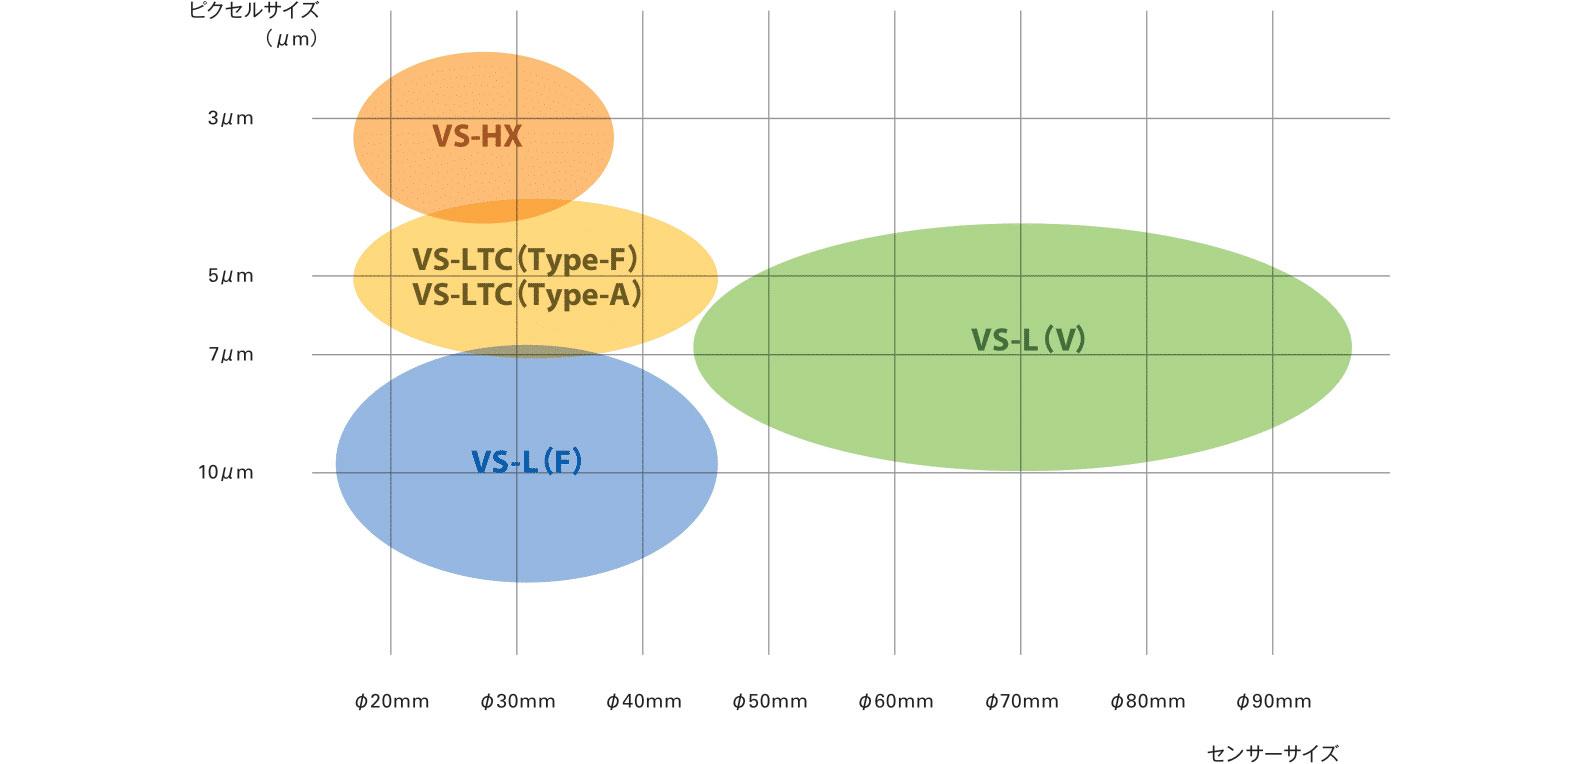 table_splash_line-scan.jpg